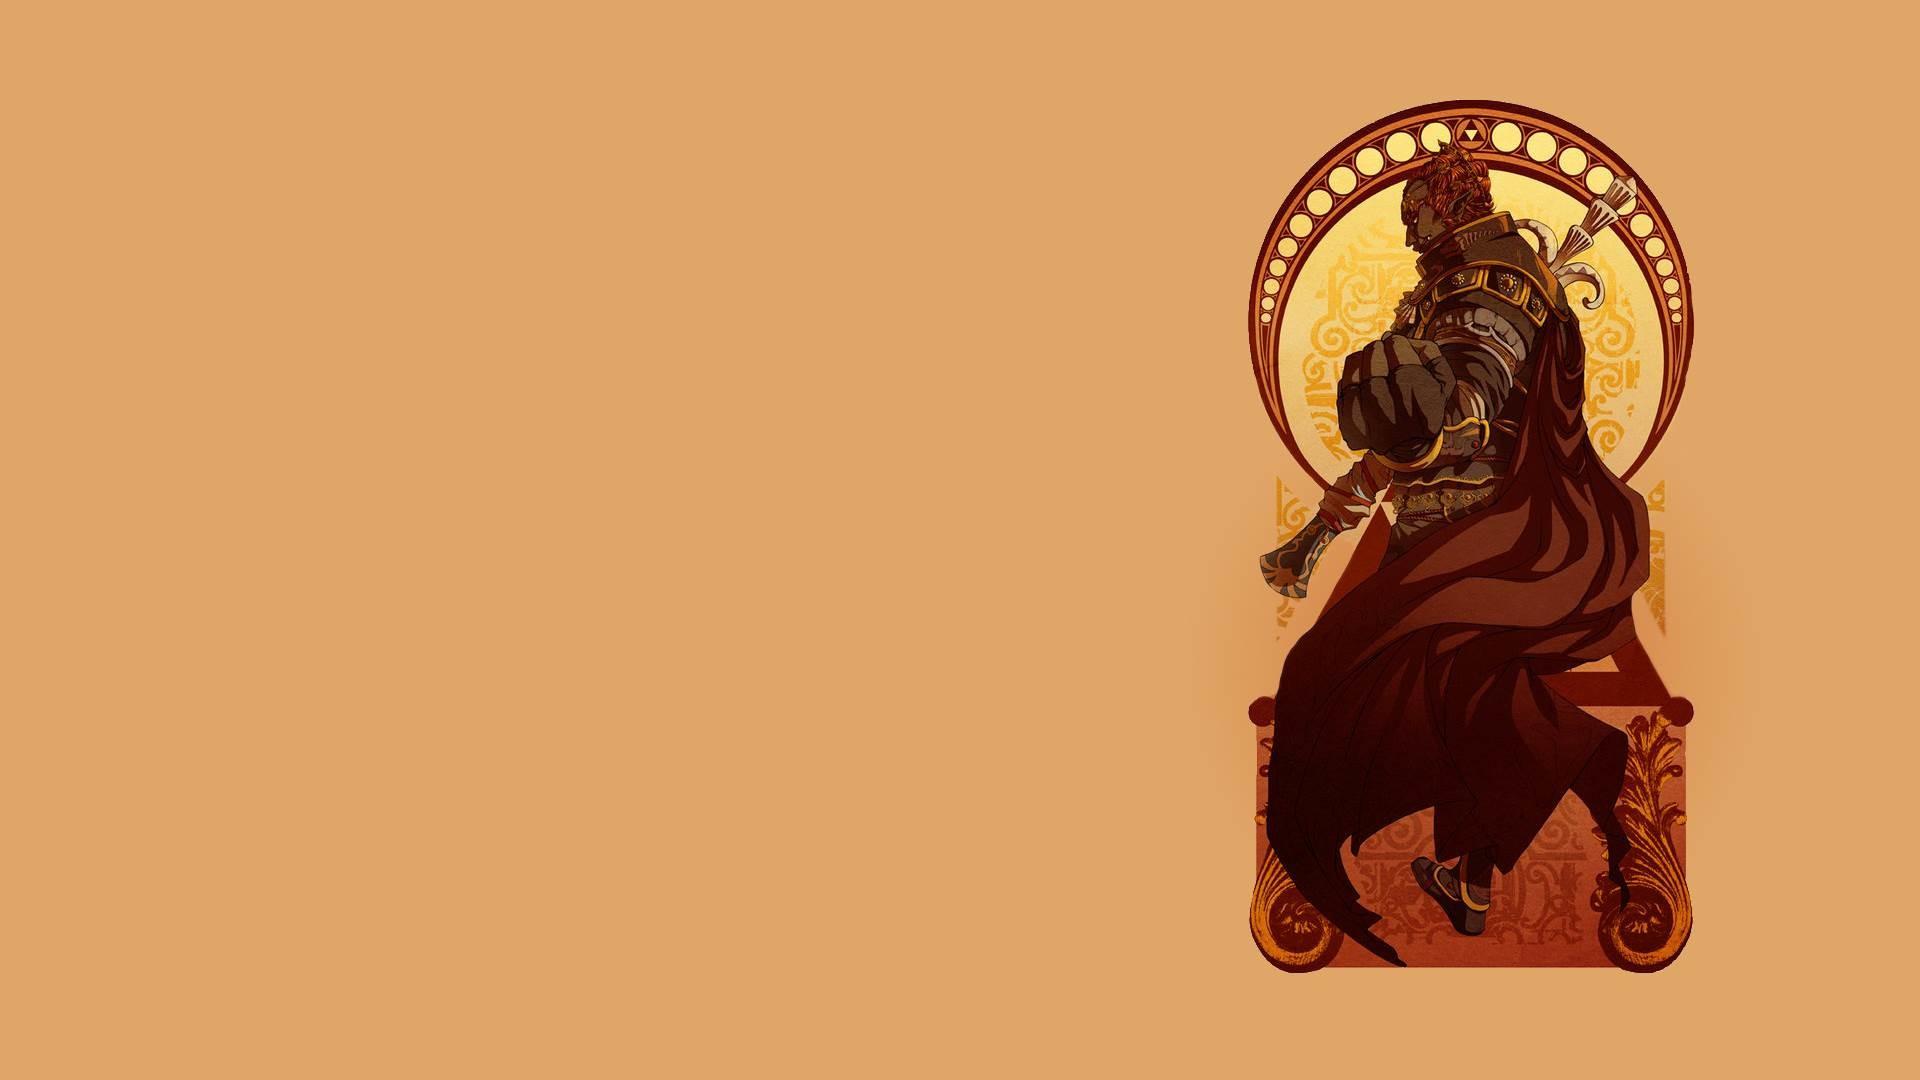 Ganondorf Wallpaper 1